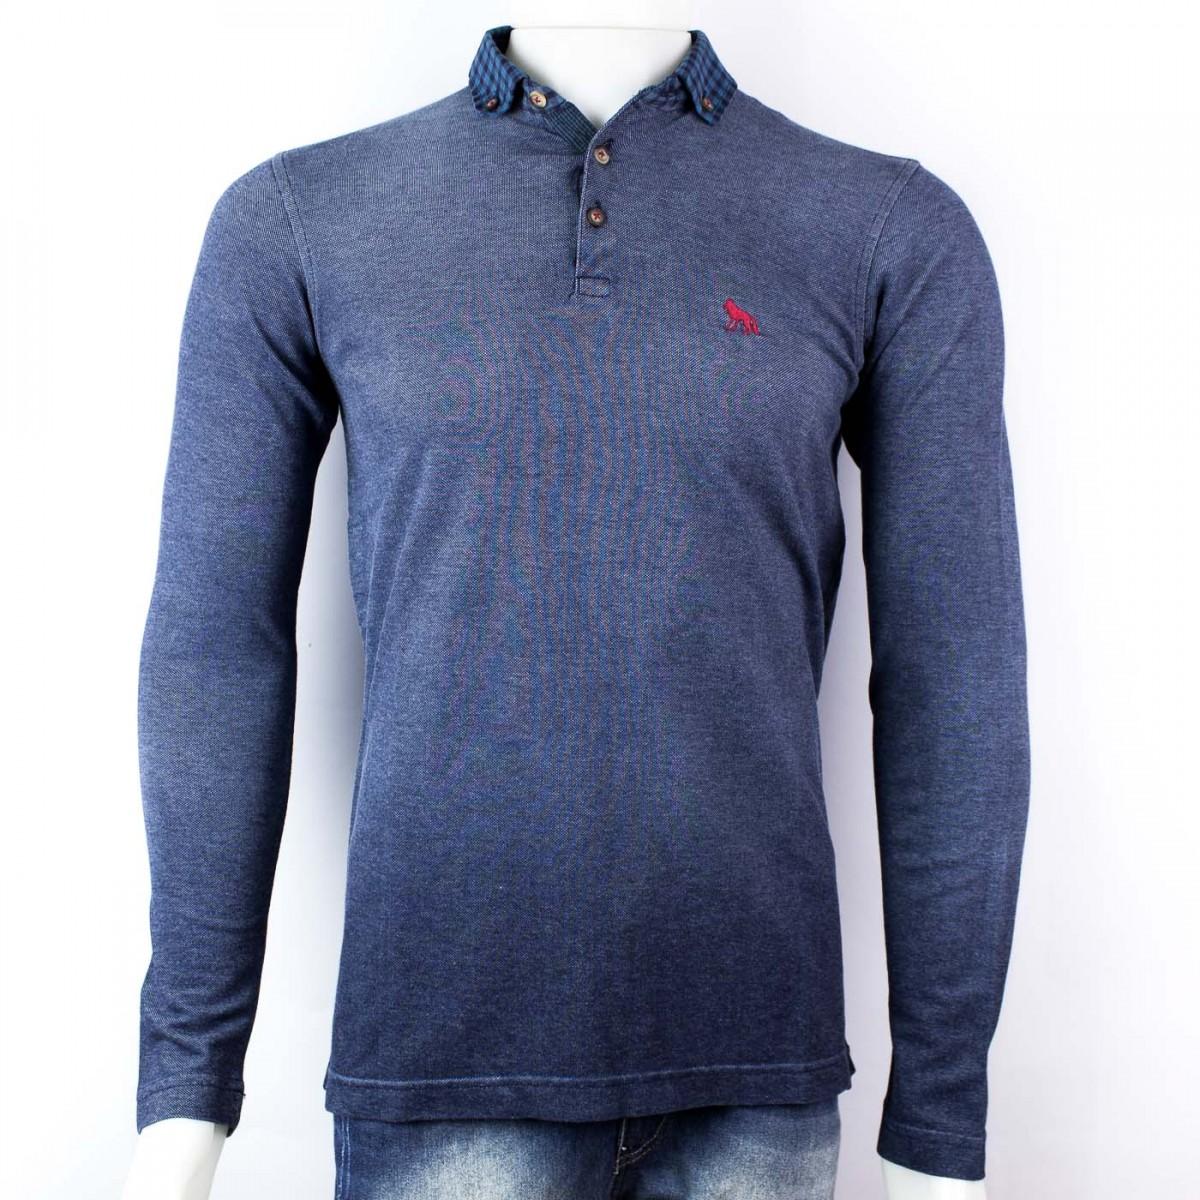 f7de1d0051 Bizz Store - Camisa Polo Masculina Acostamento Manga Longa Azul